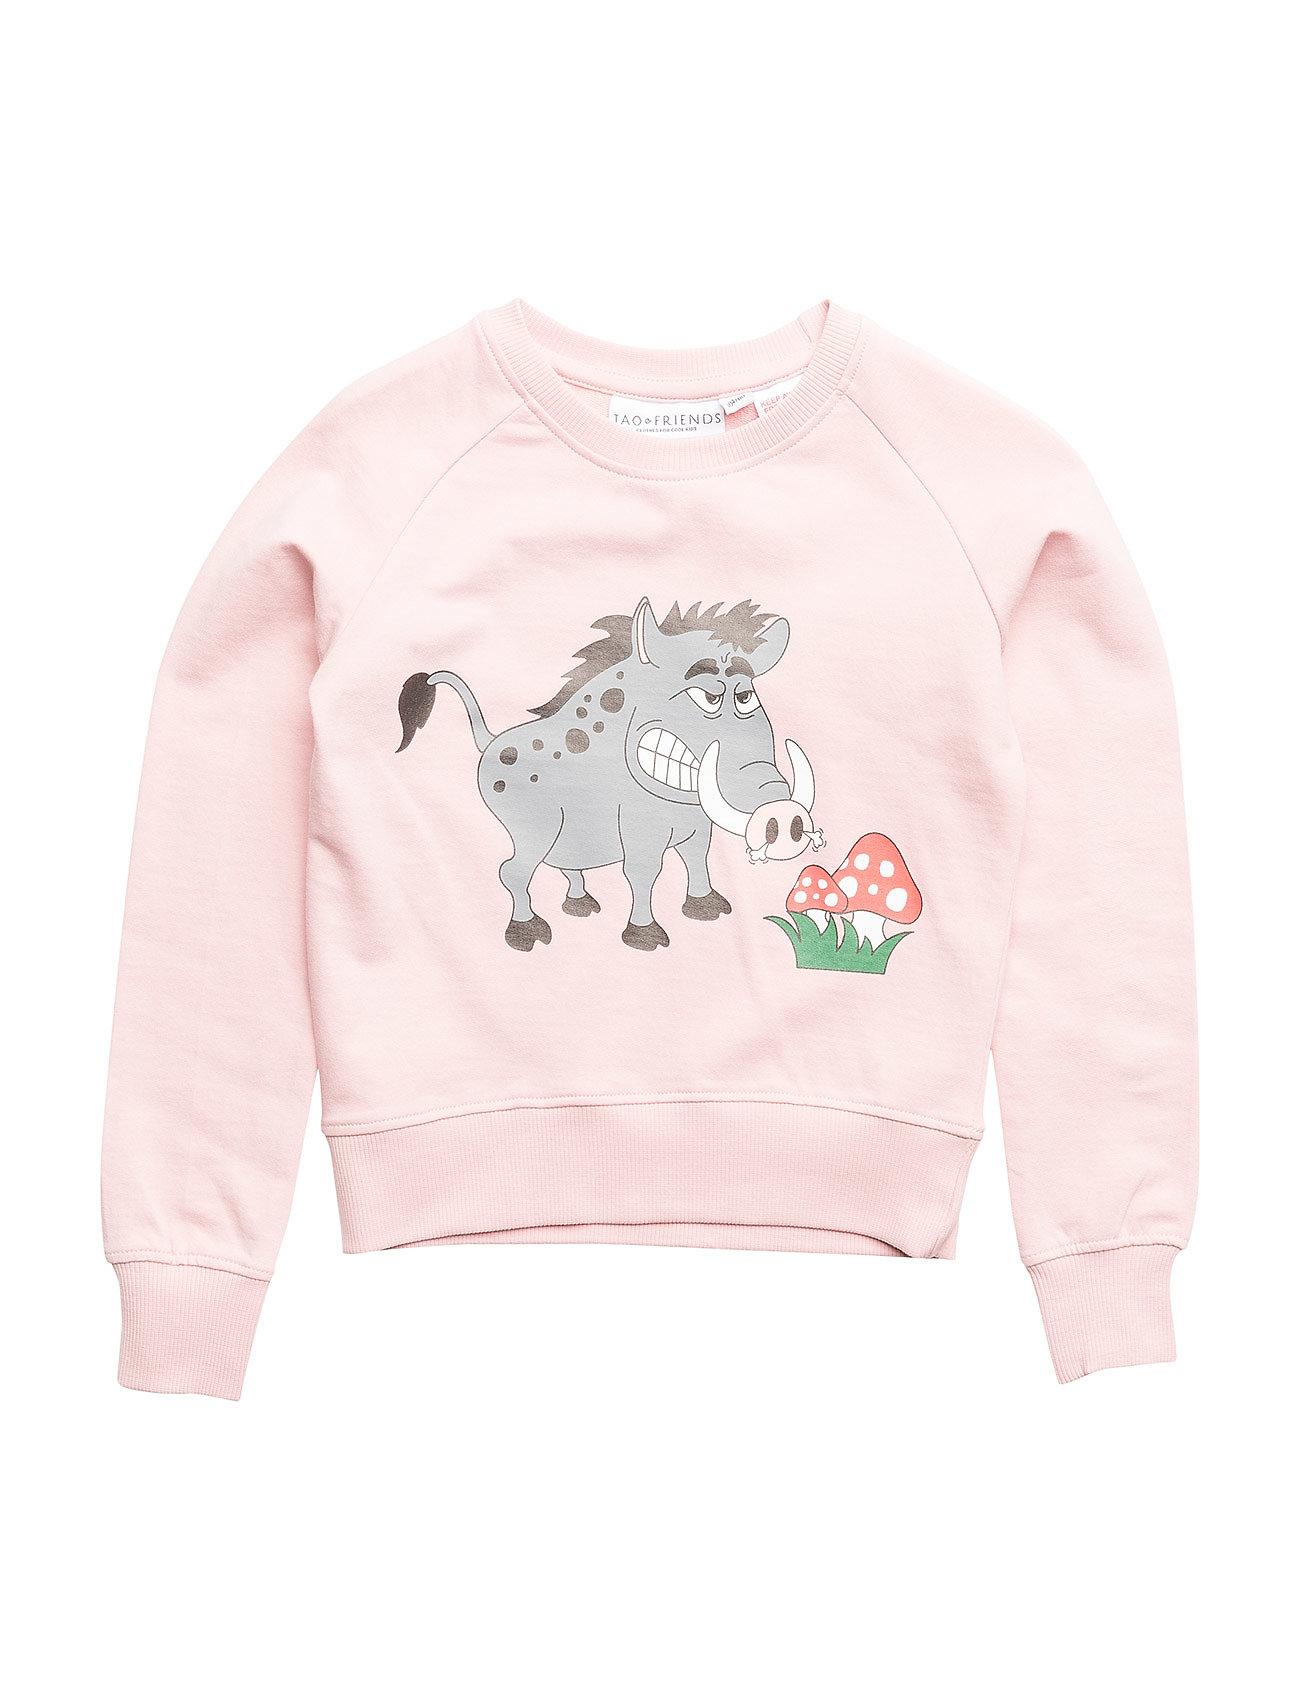 Sweatshirt Vildsvinet Pink 2050 Tao Friends Booztcom